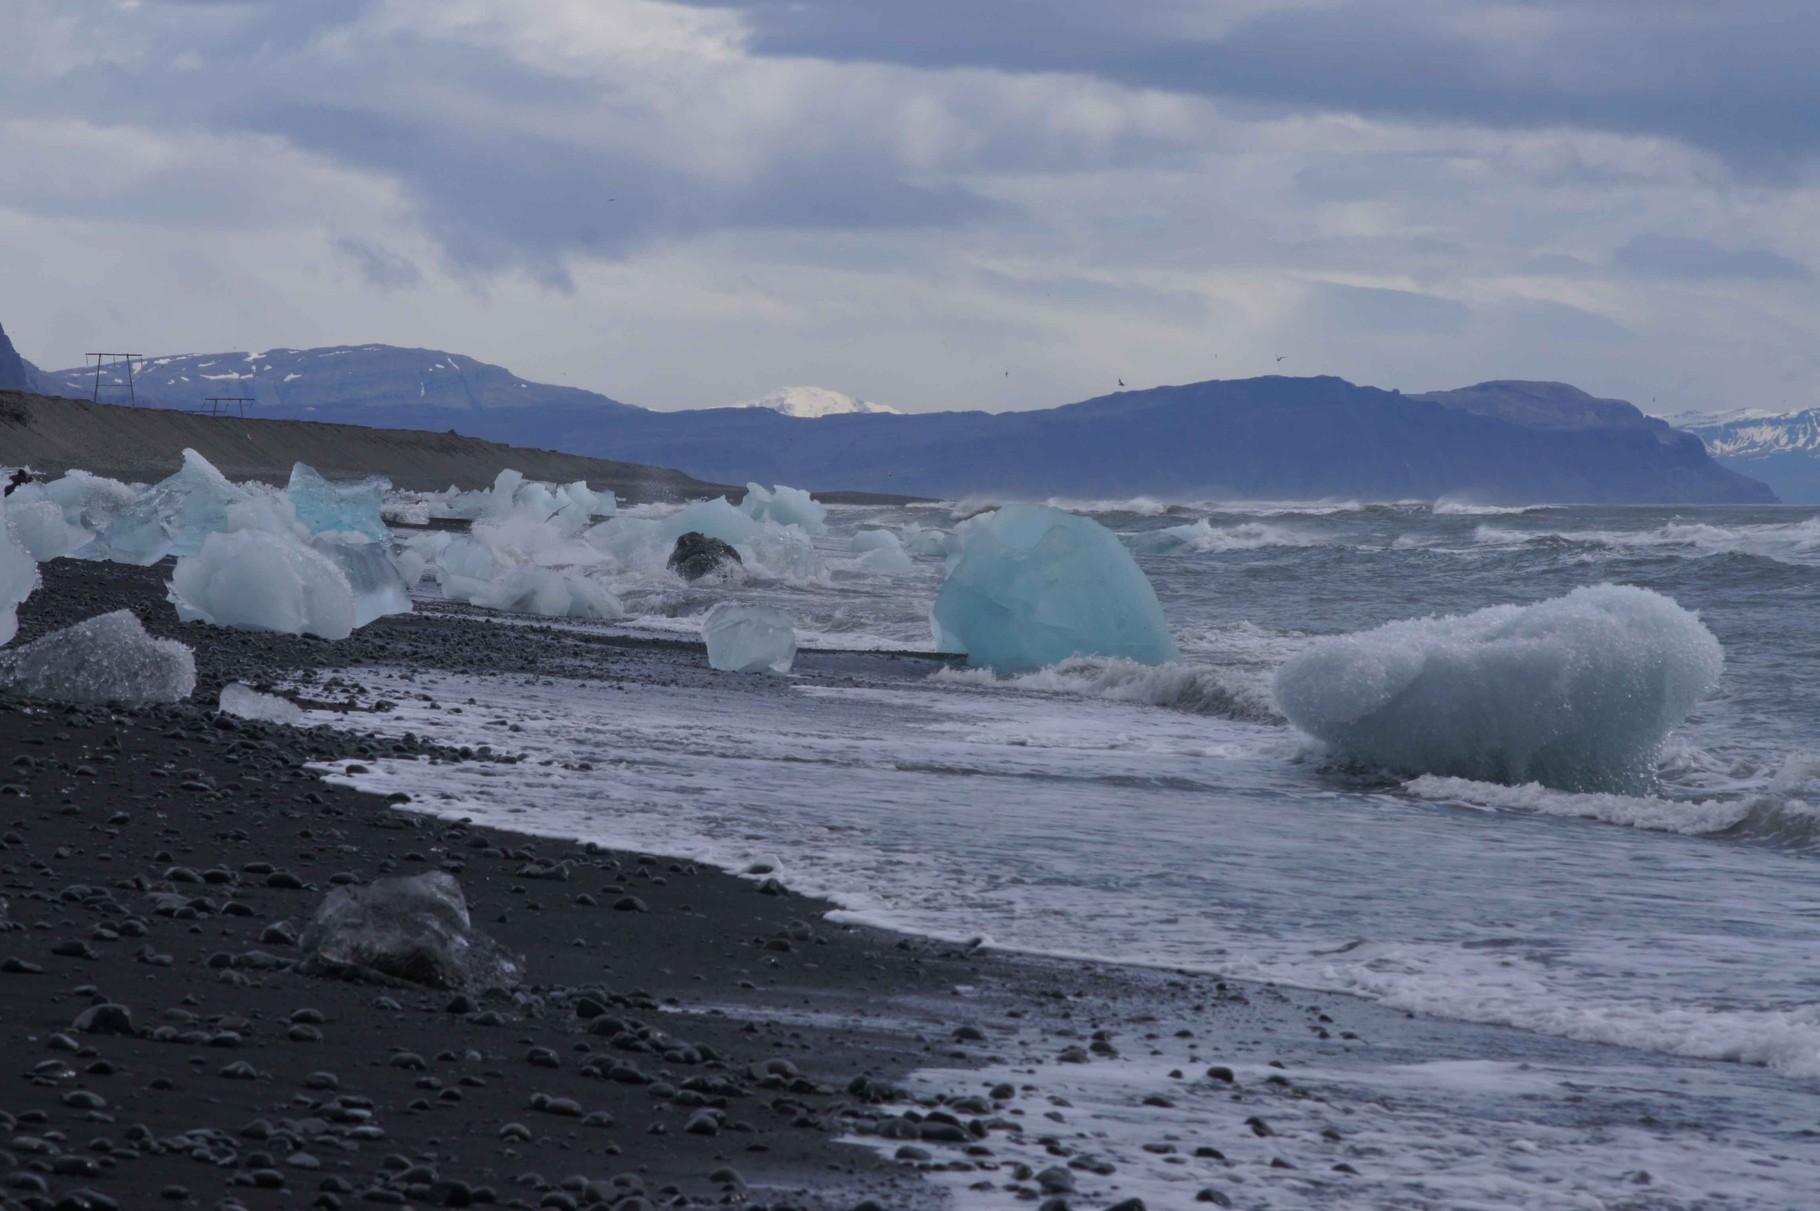 Kontraste: Eis auf schwarzem Aschesand bei Jökülsárlón